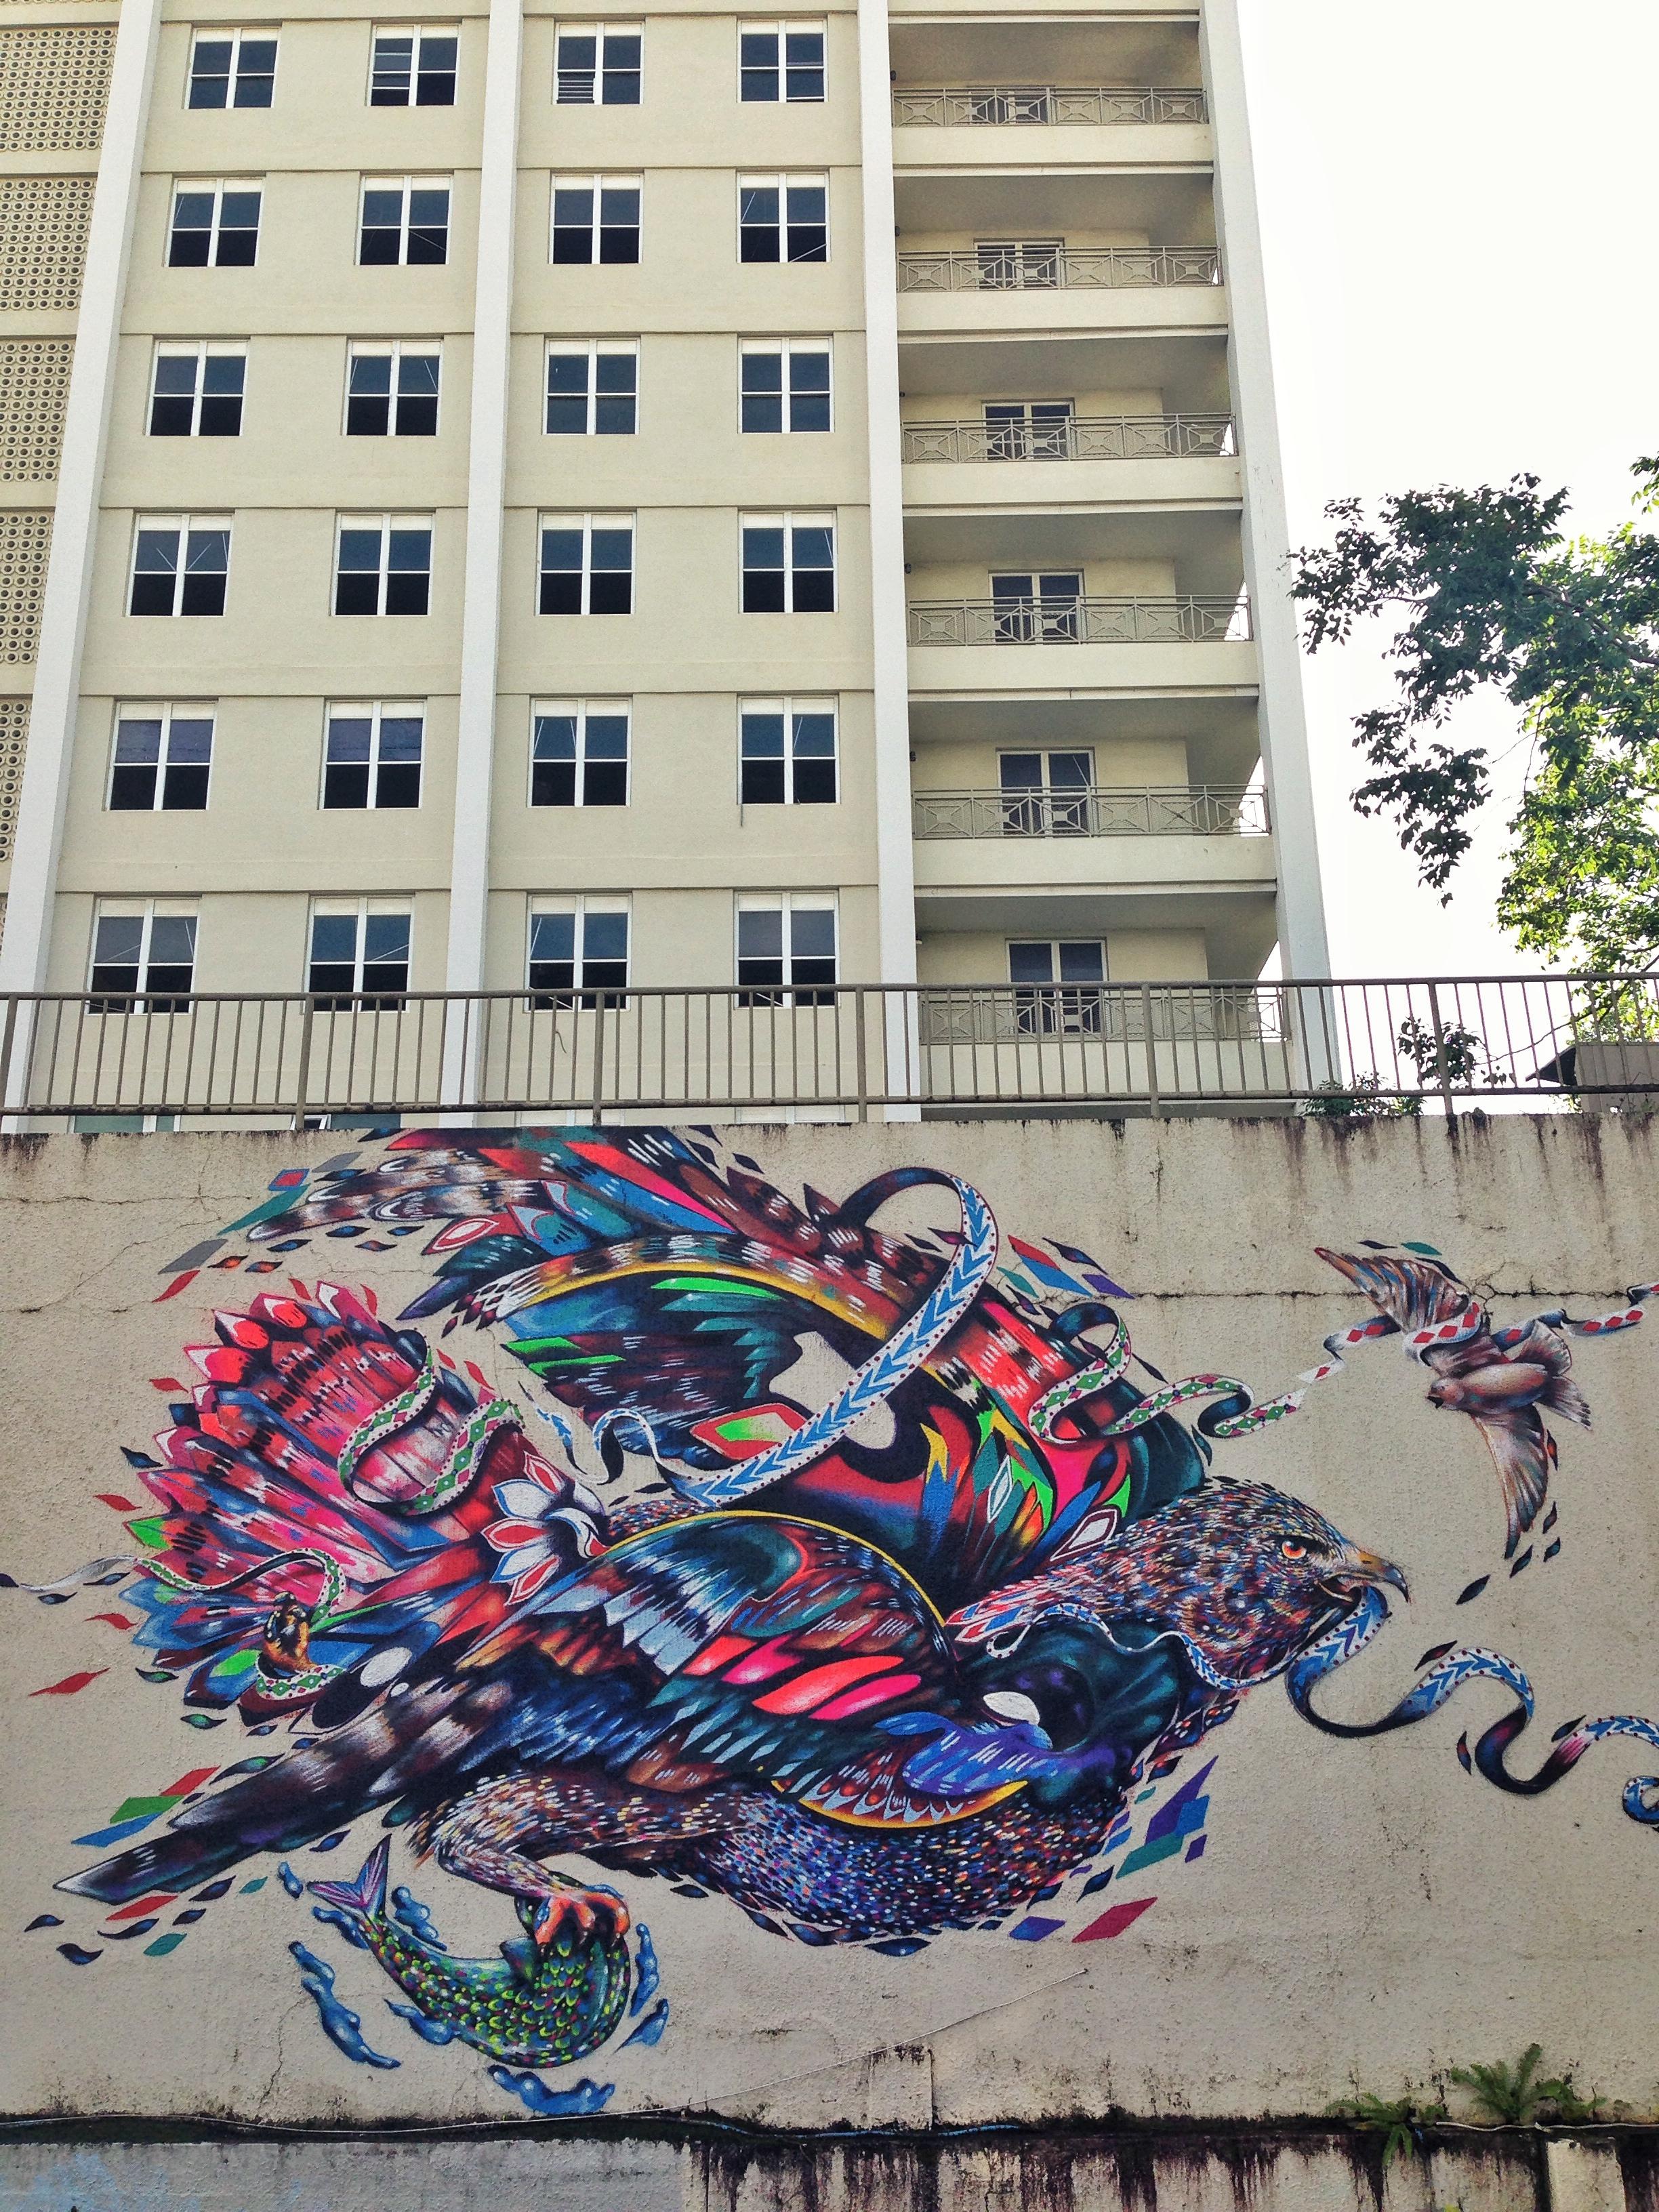 Large scale mural. San Juan (santurce). Puerto Rico 2013.  Yatika Starr Fields